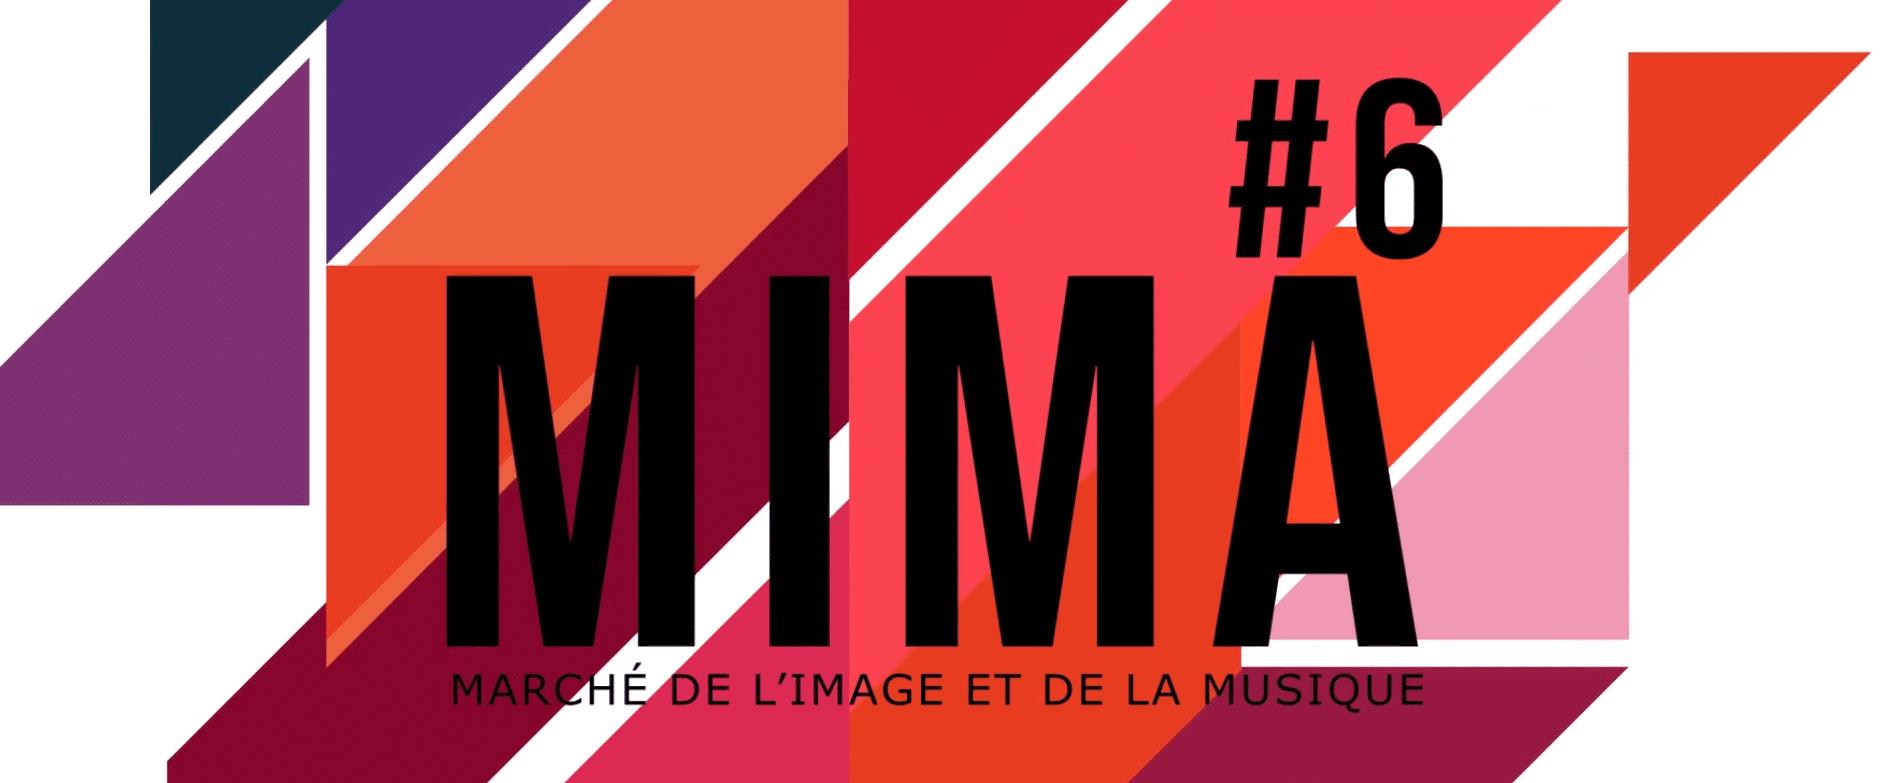 Teaser MIMA #6